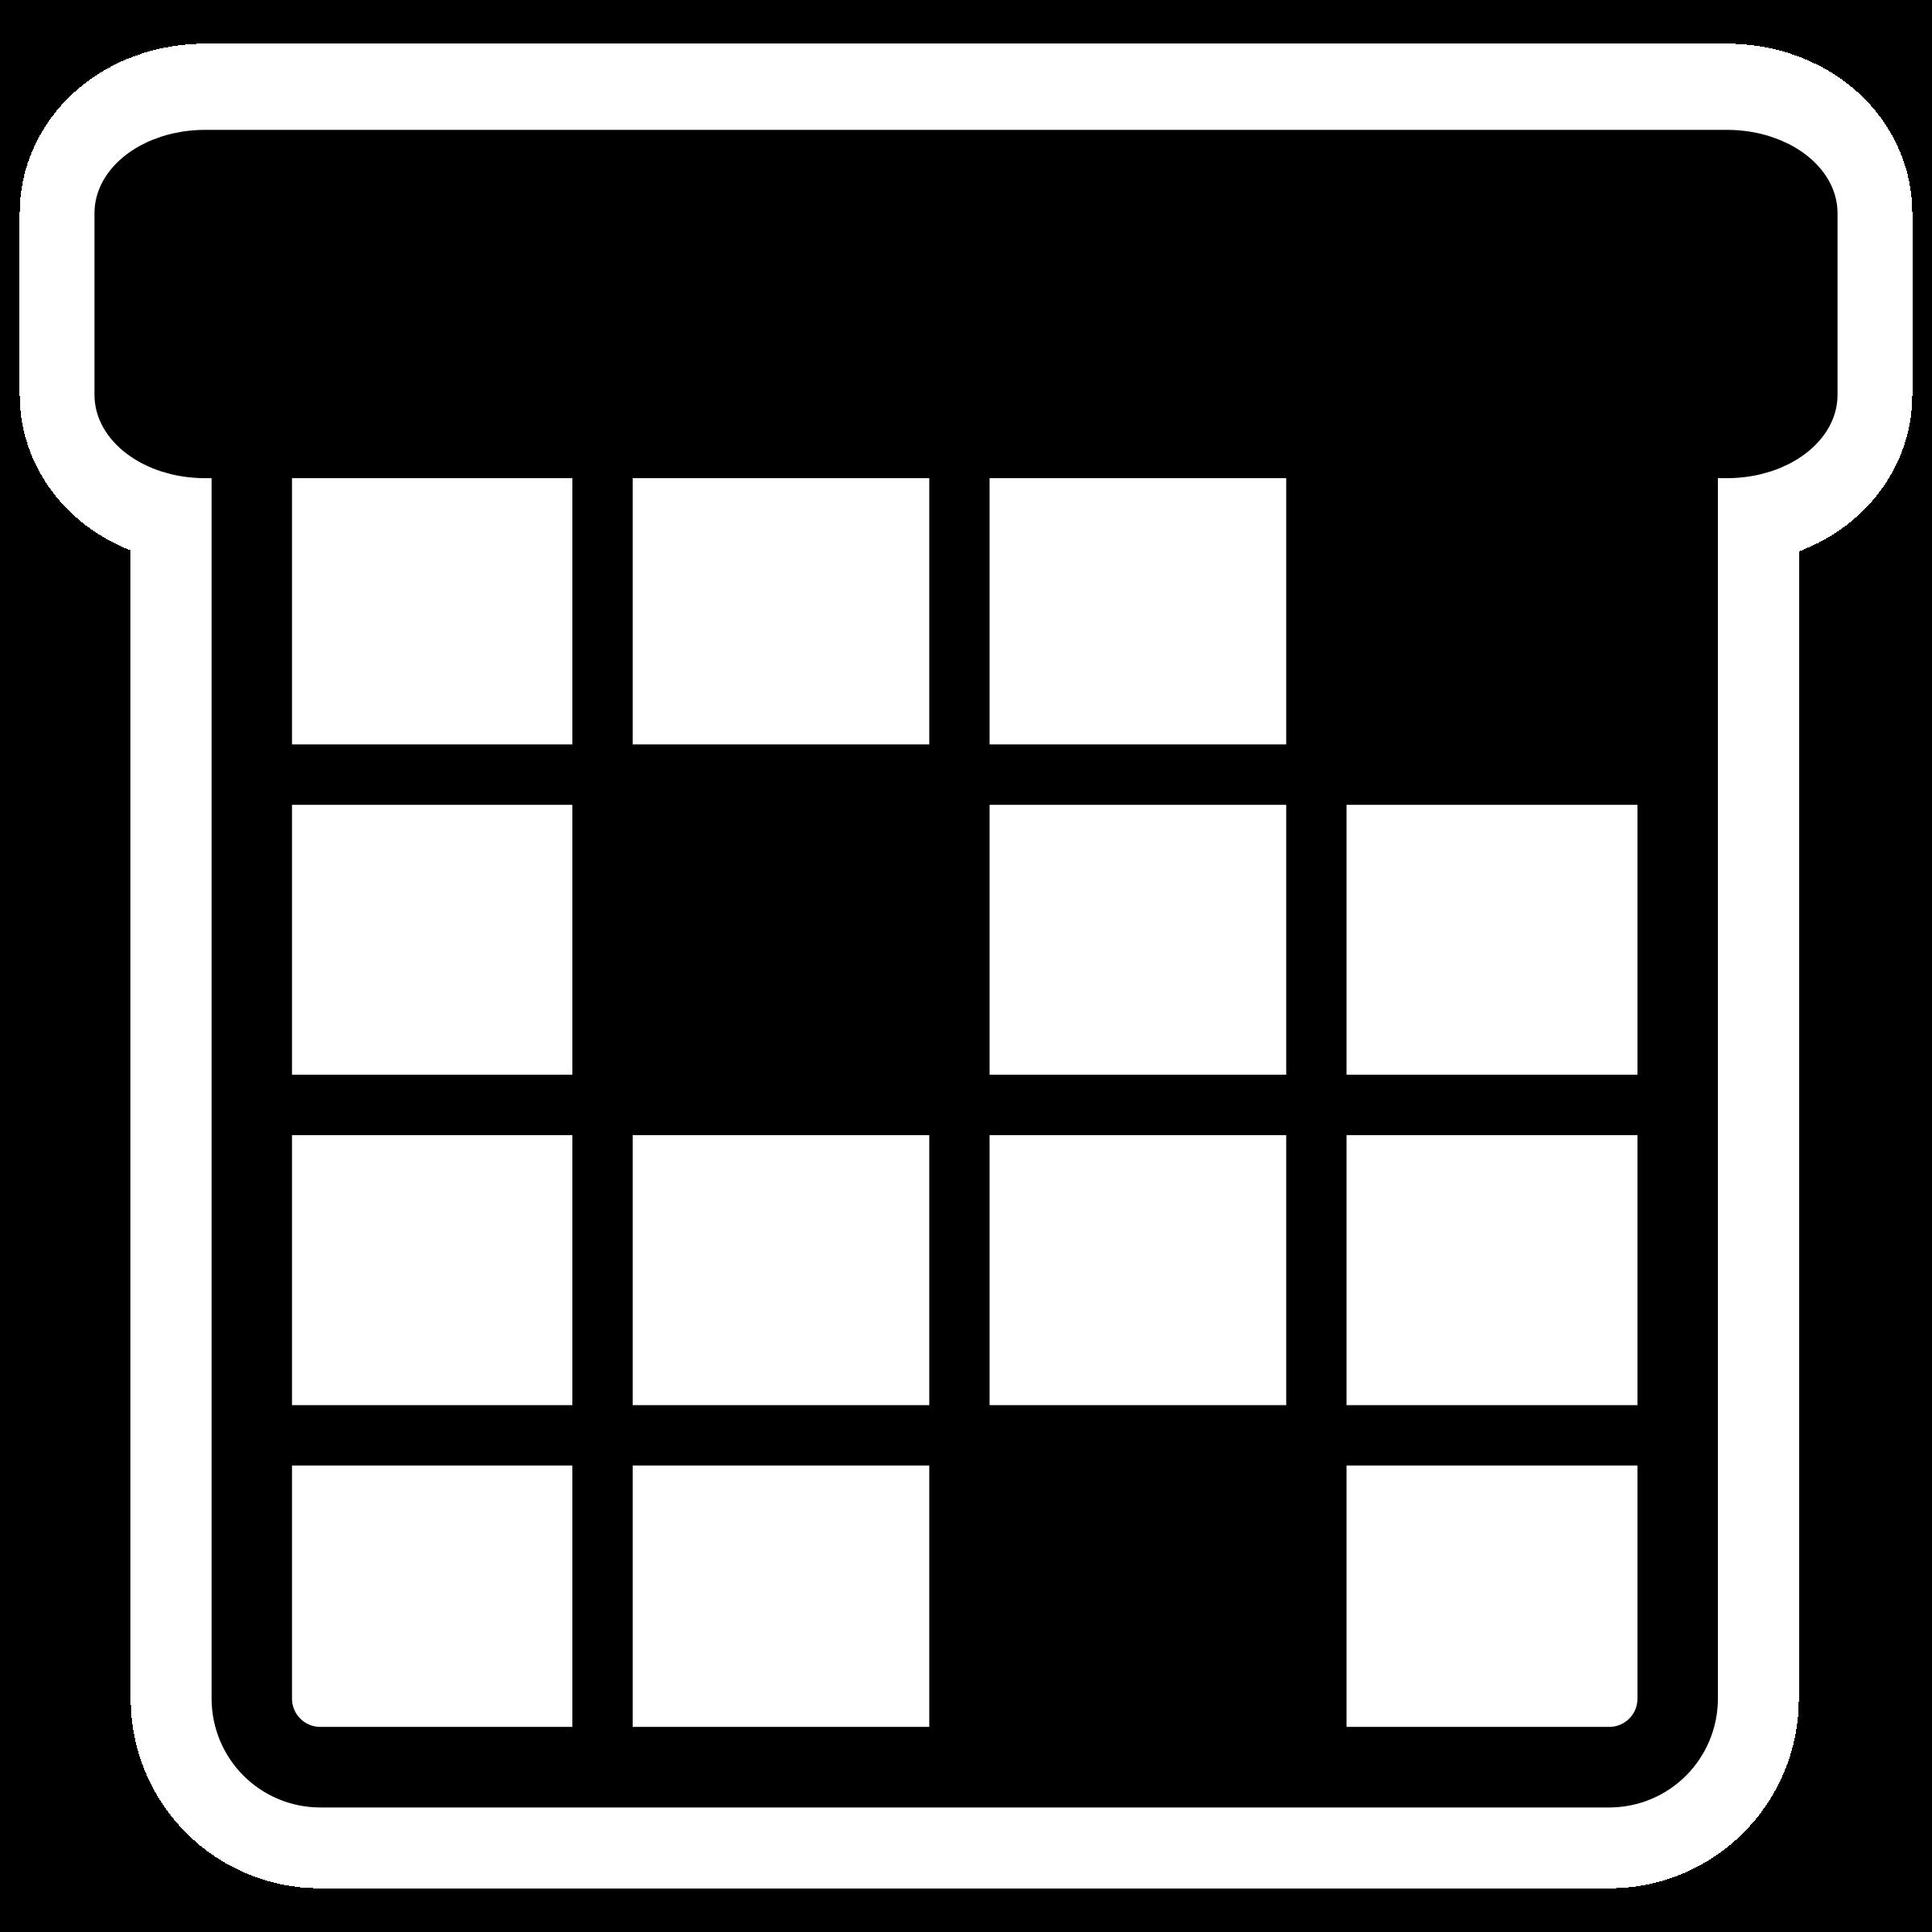 picture library Agenda clipart. Mono big image png